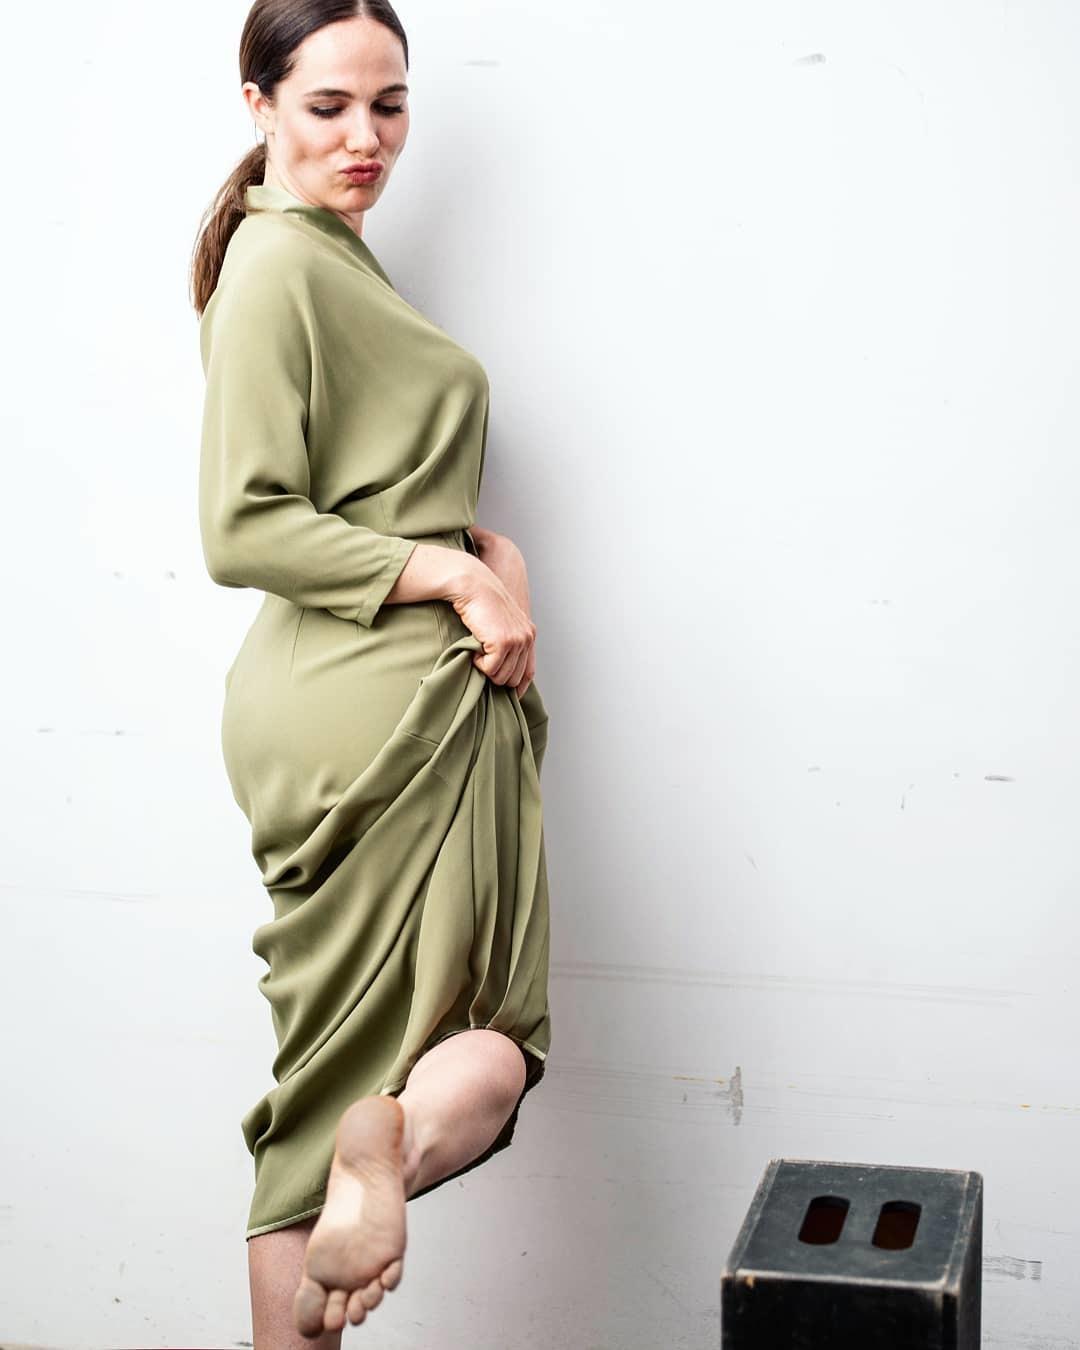 Get Verena Altenberger Pictures